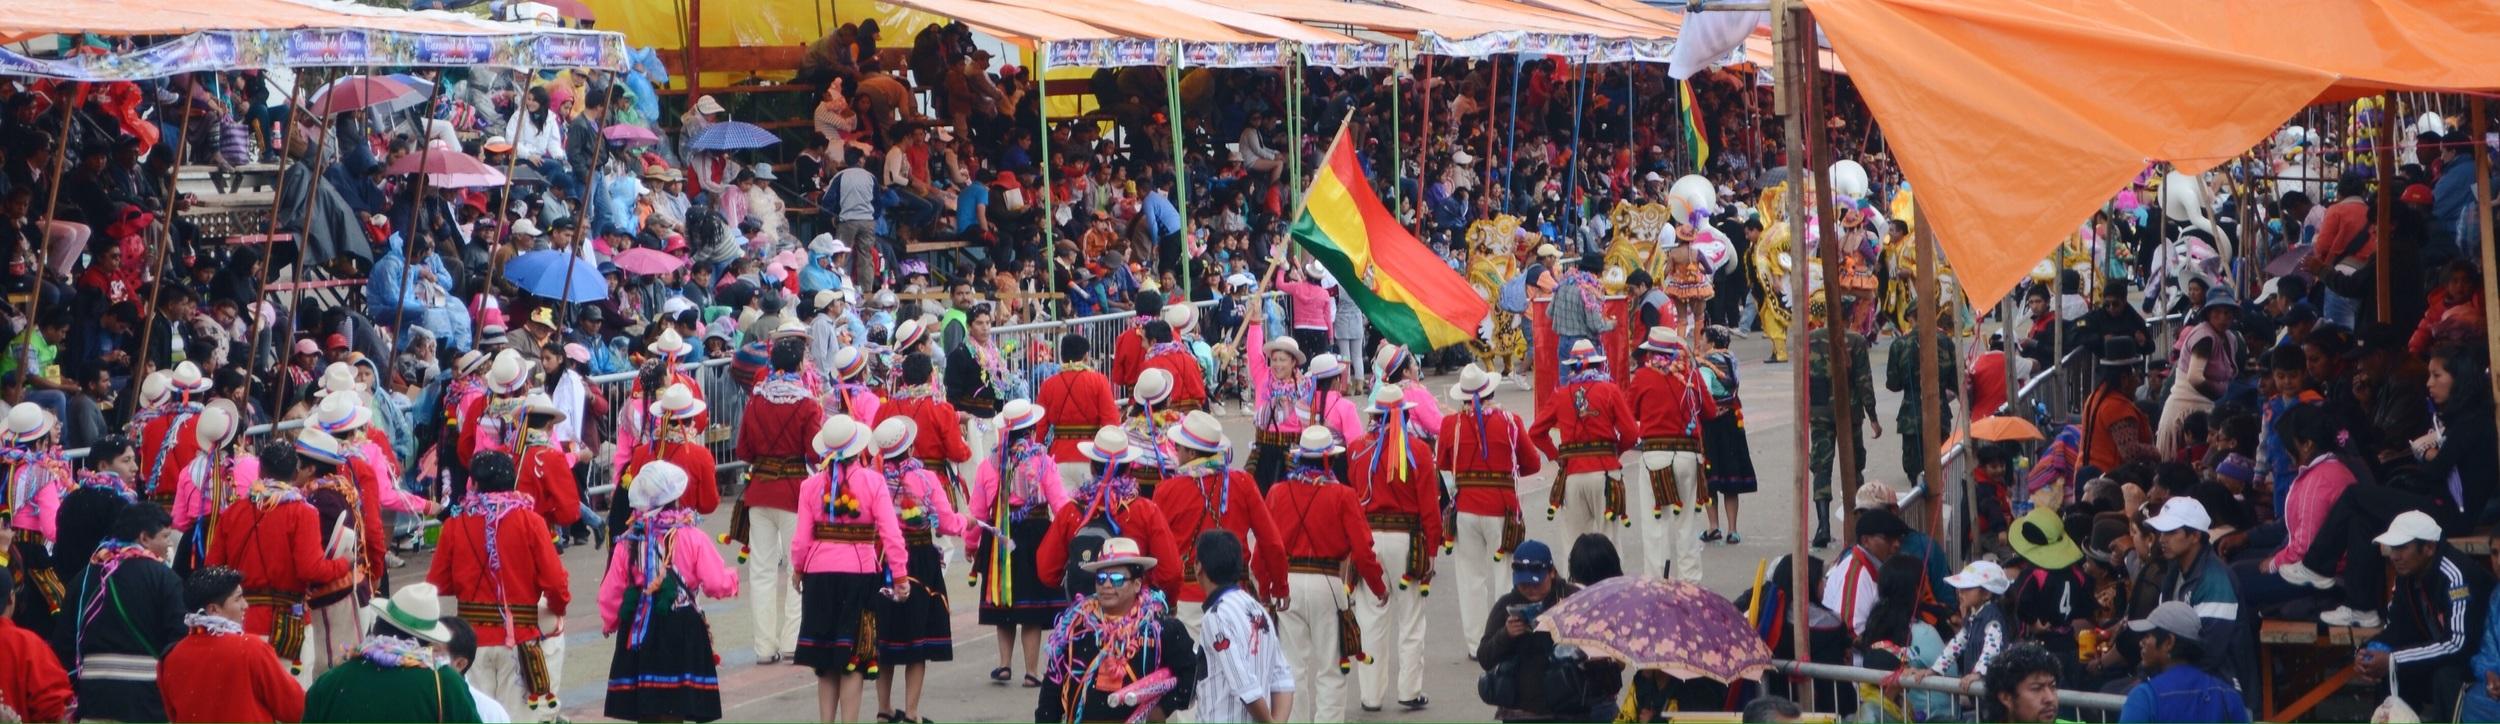 Waving the Bolivian flag // 15 february 2015